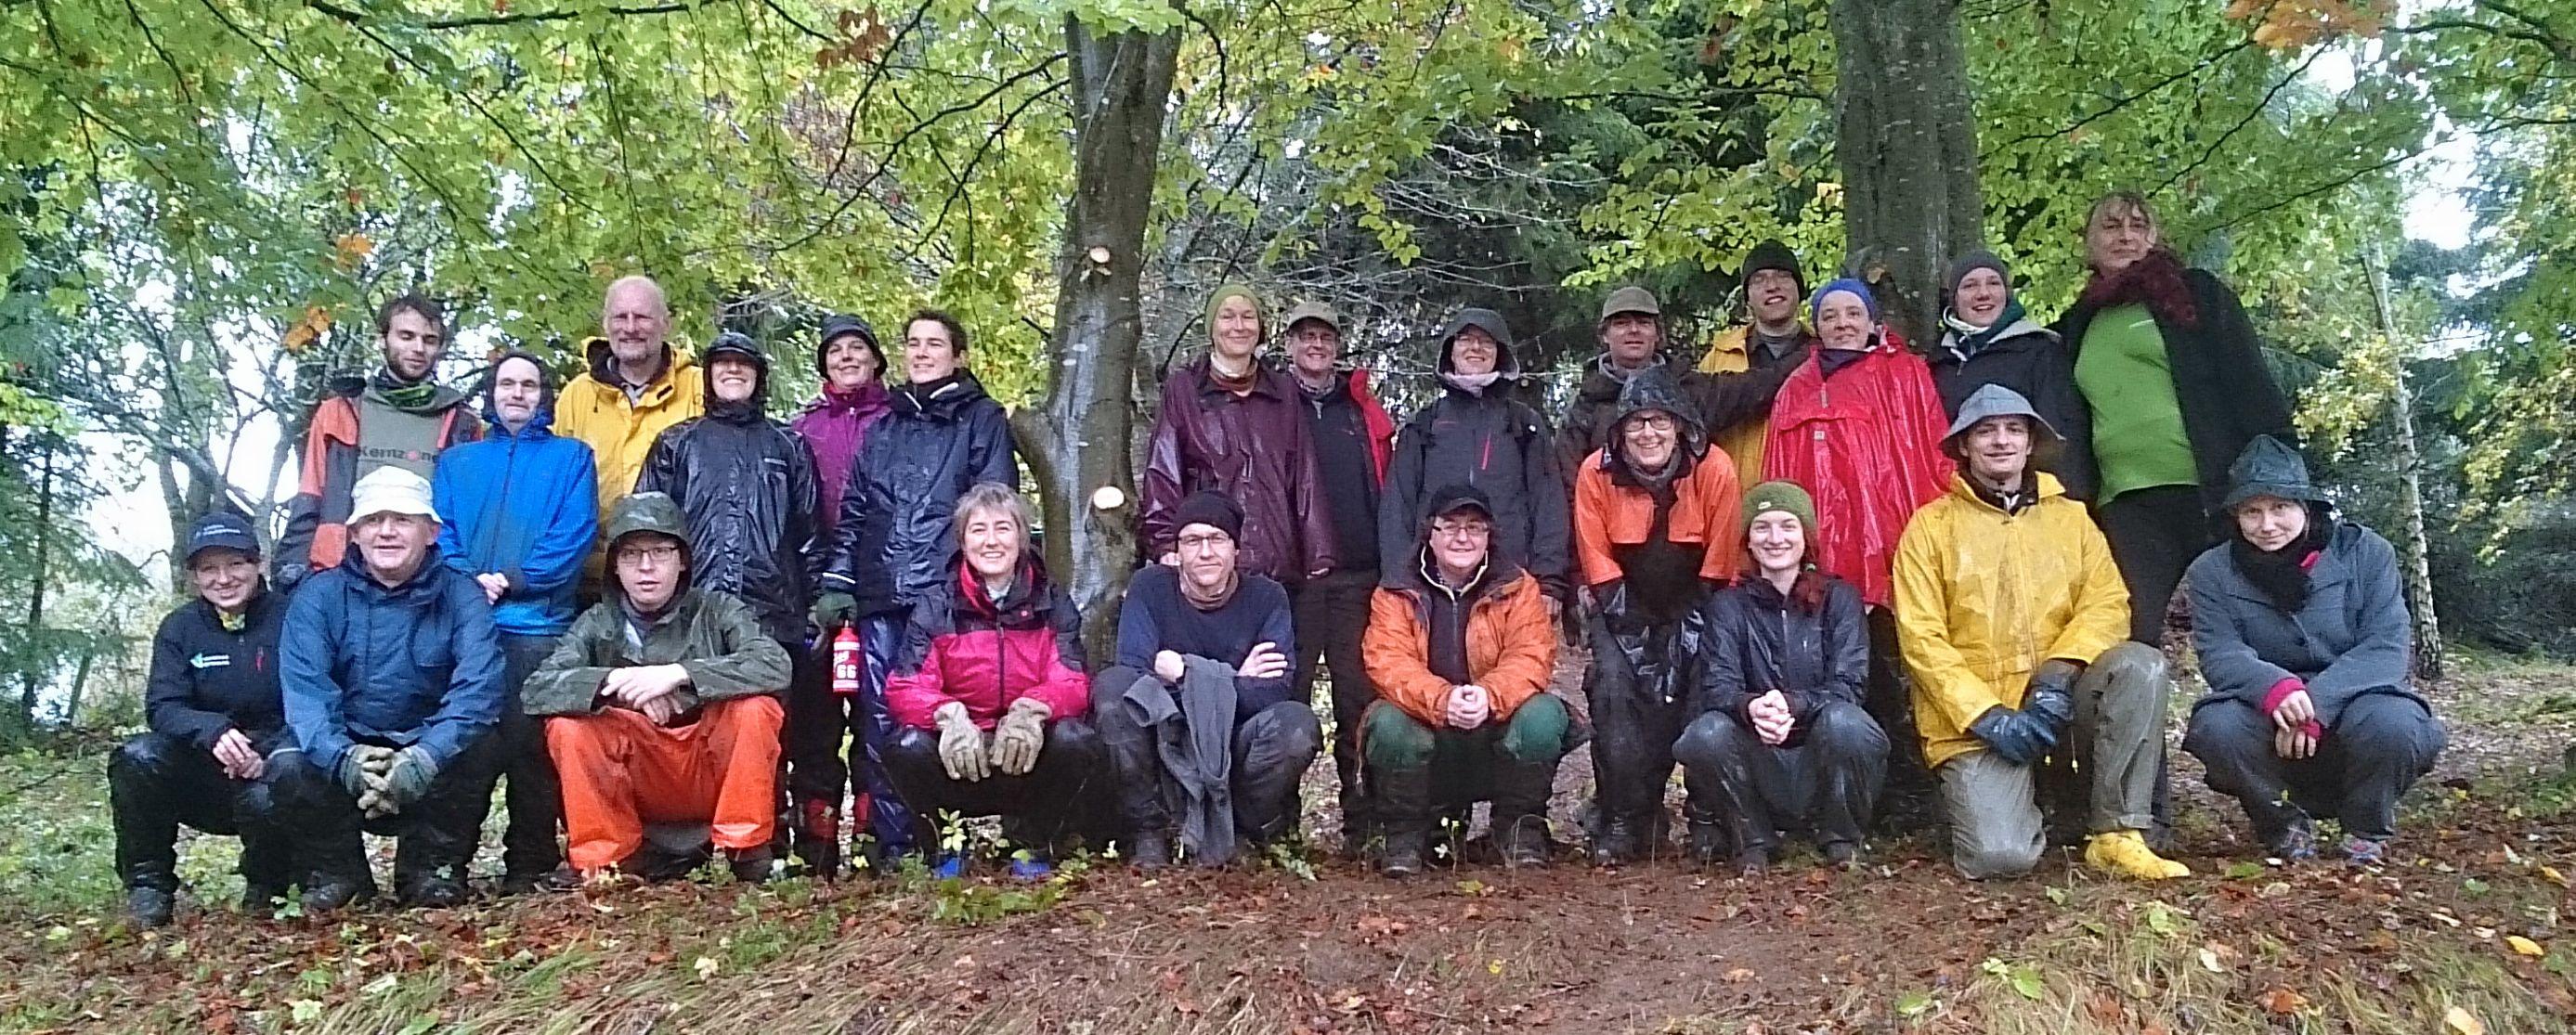 Freiwilligengruppenbild am Wacholderhang